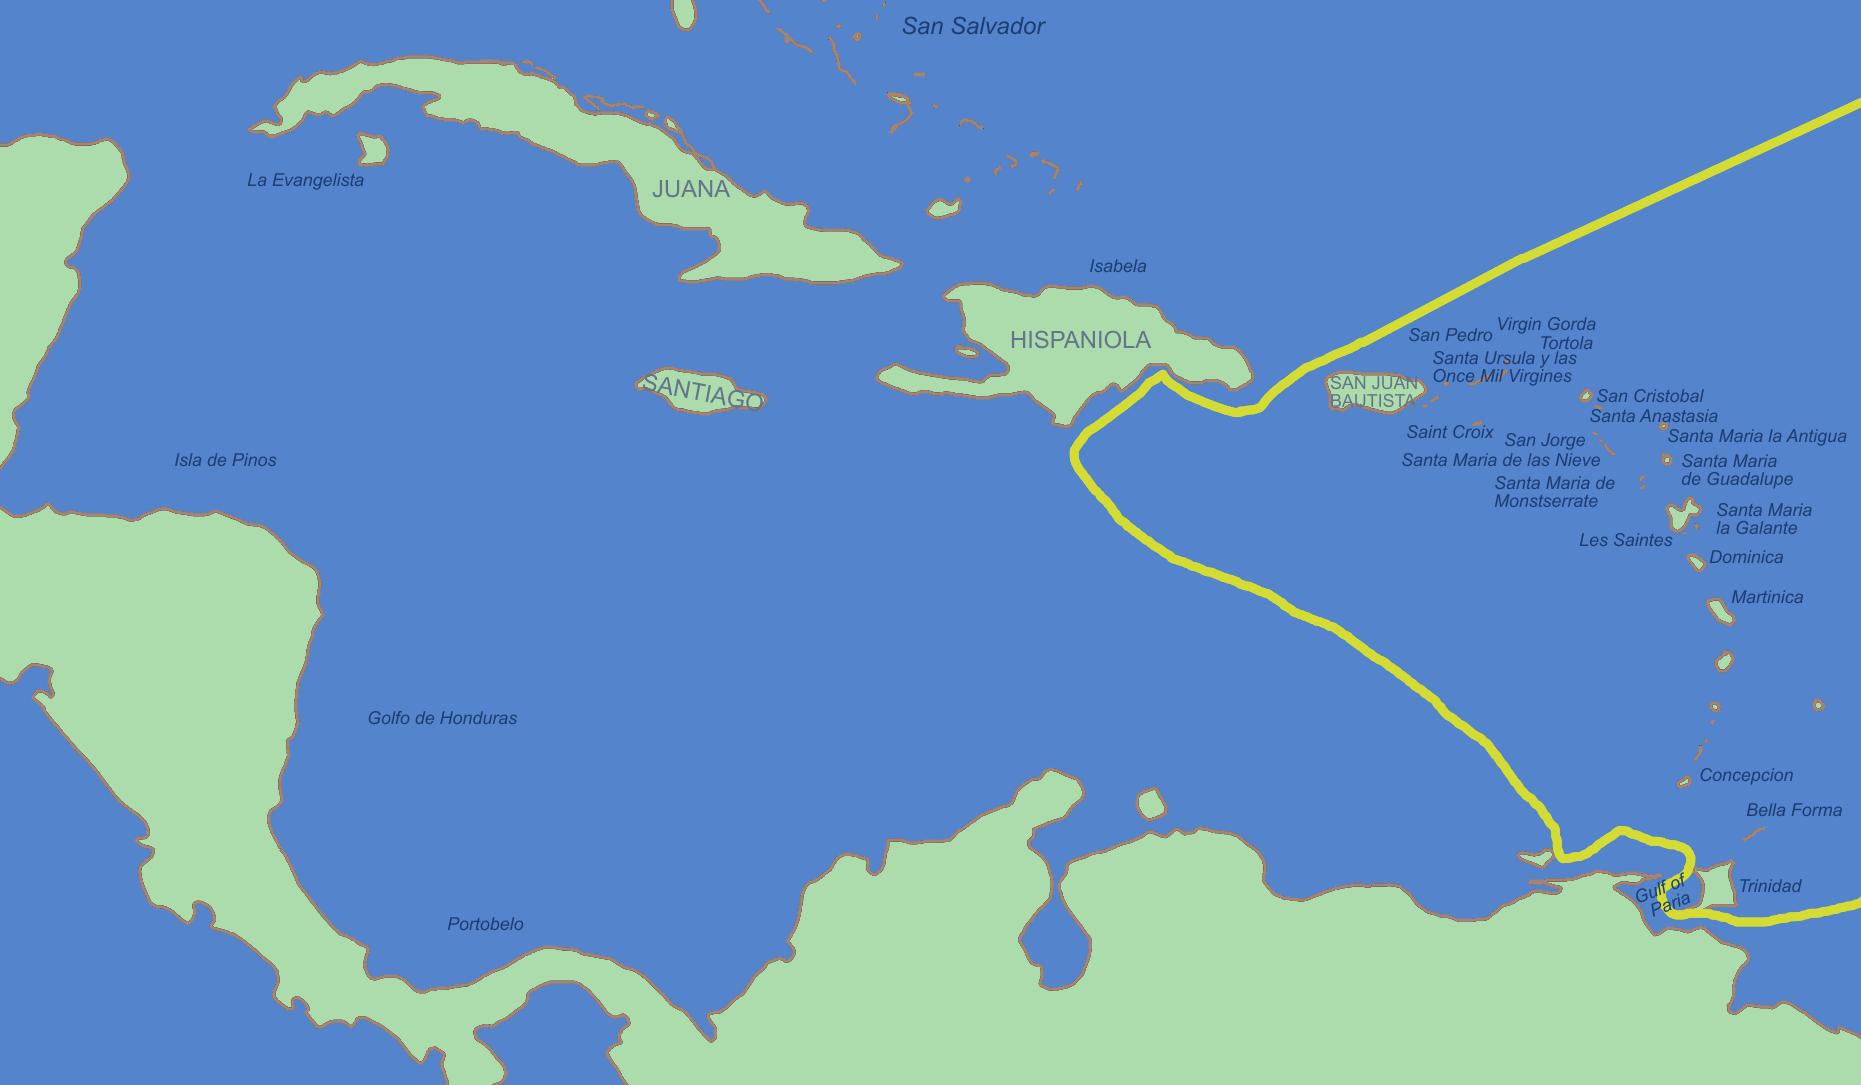 Tercer viaje de Cristóbal Colón en 1498